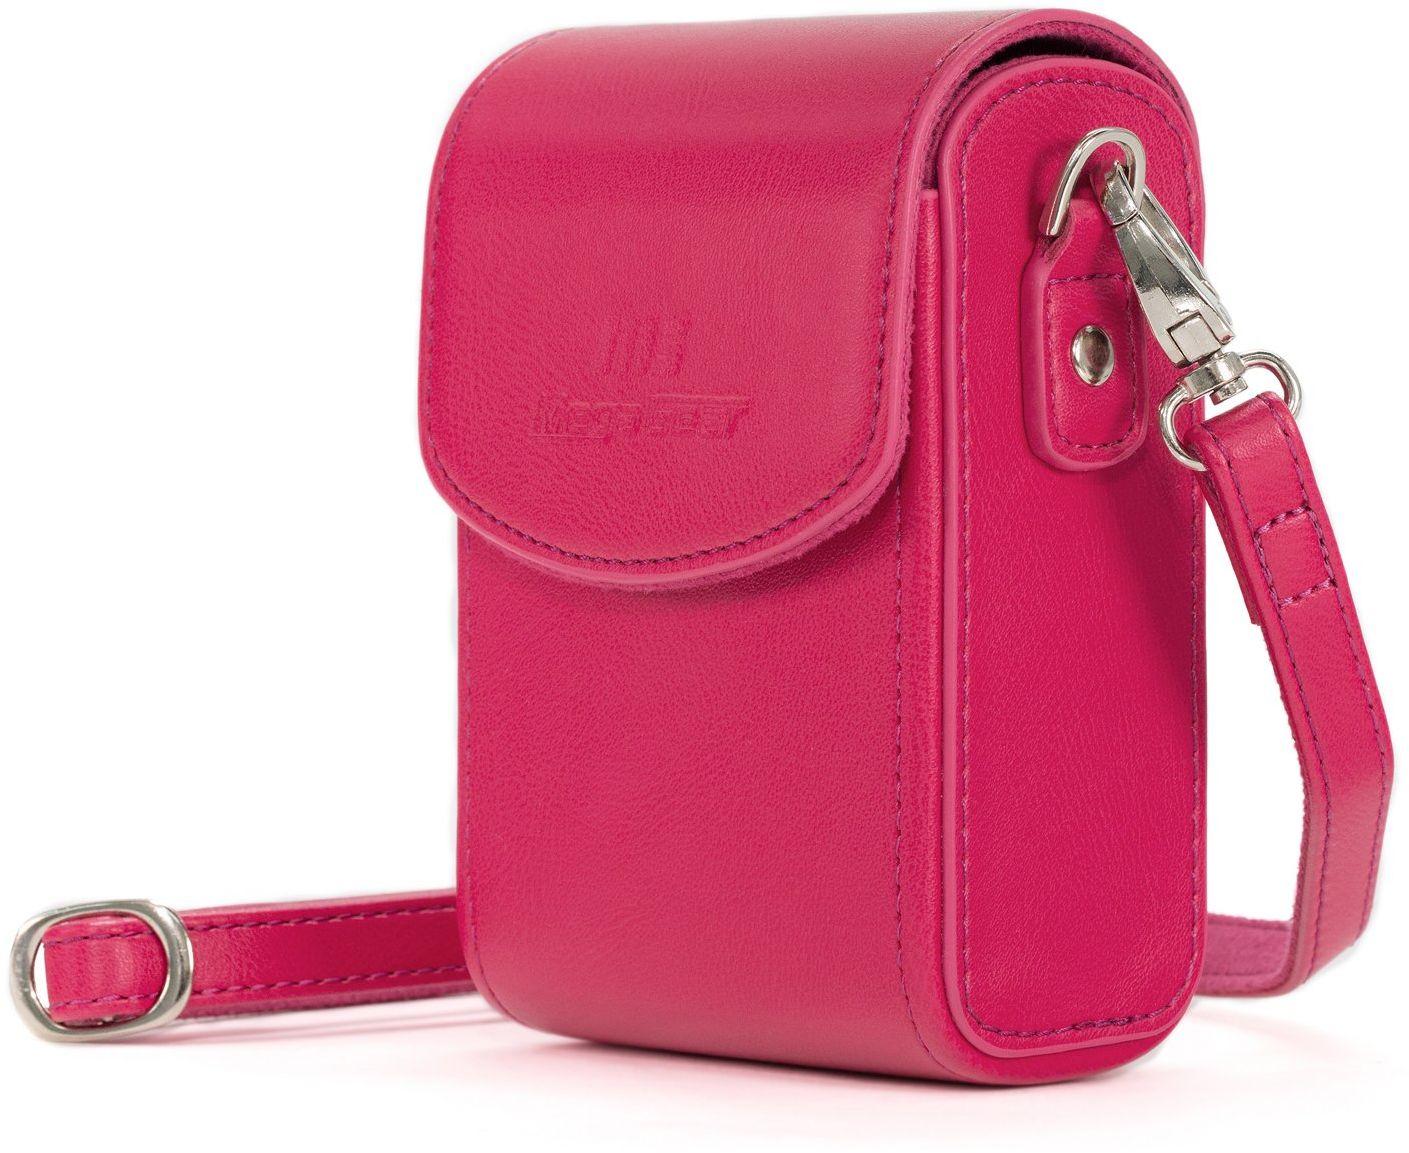 MegaGear MG1256 Nikon Coolpix A1000, A900 skórzana torba na aparat z paskiem do noszenia - różowa